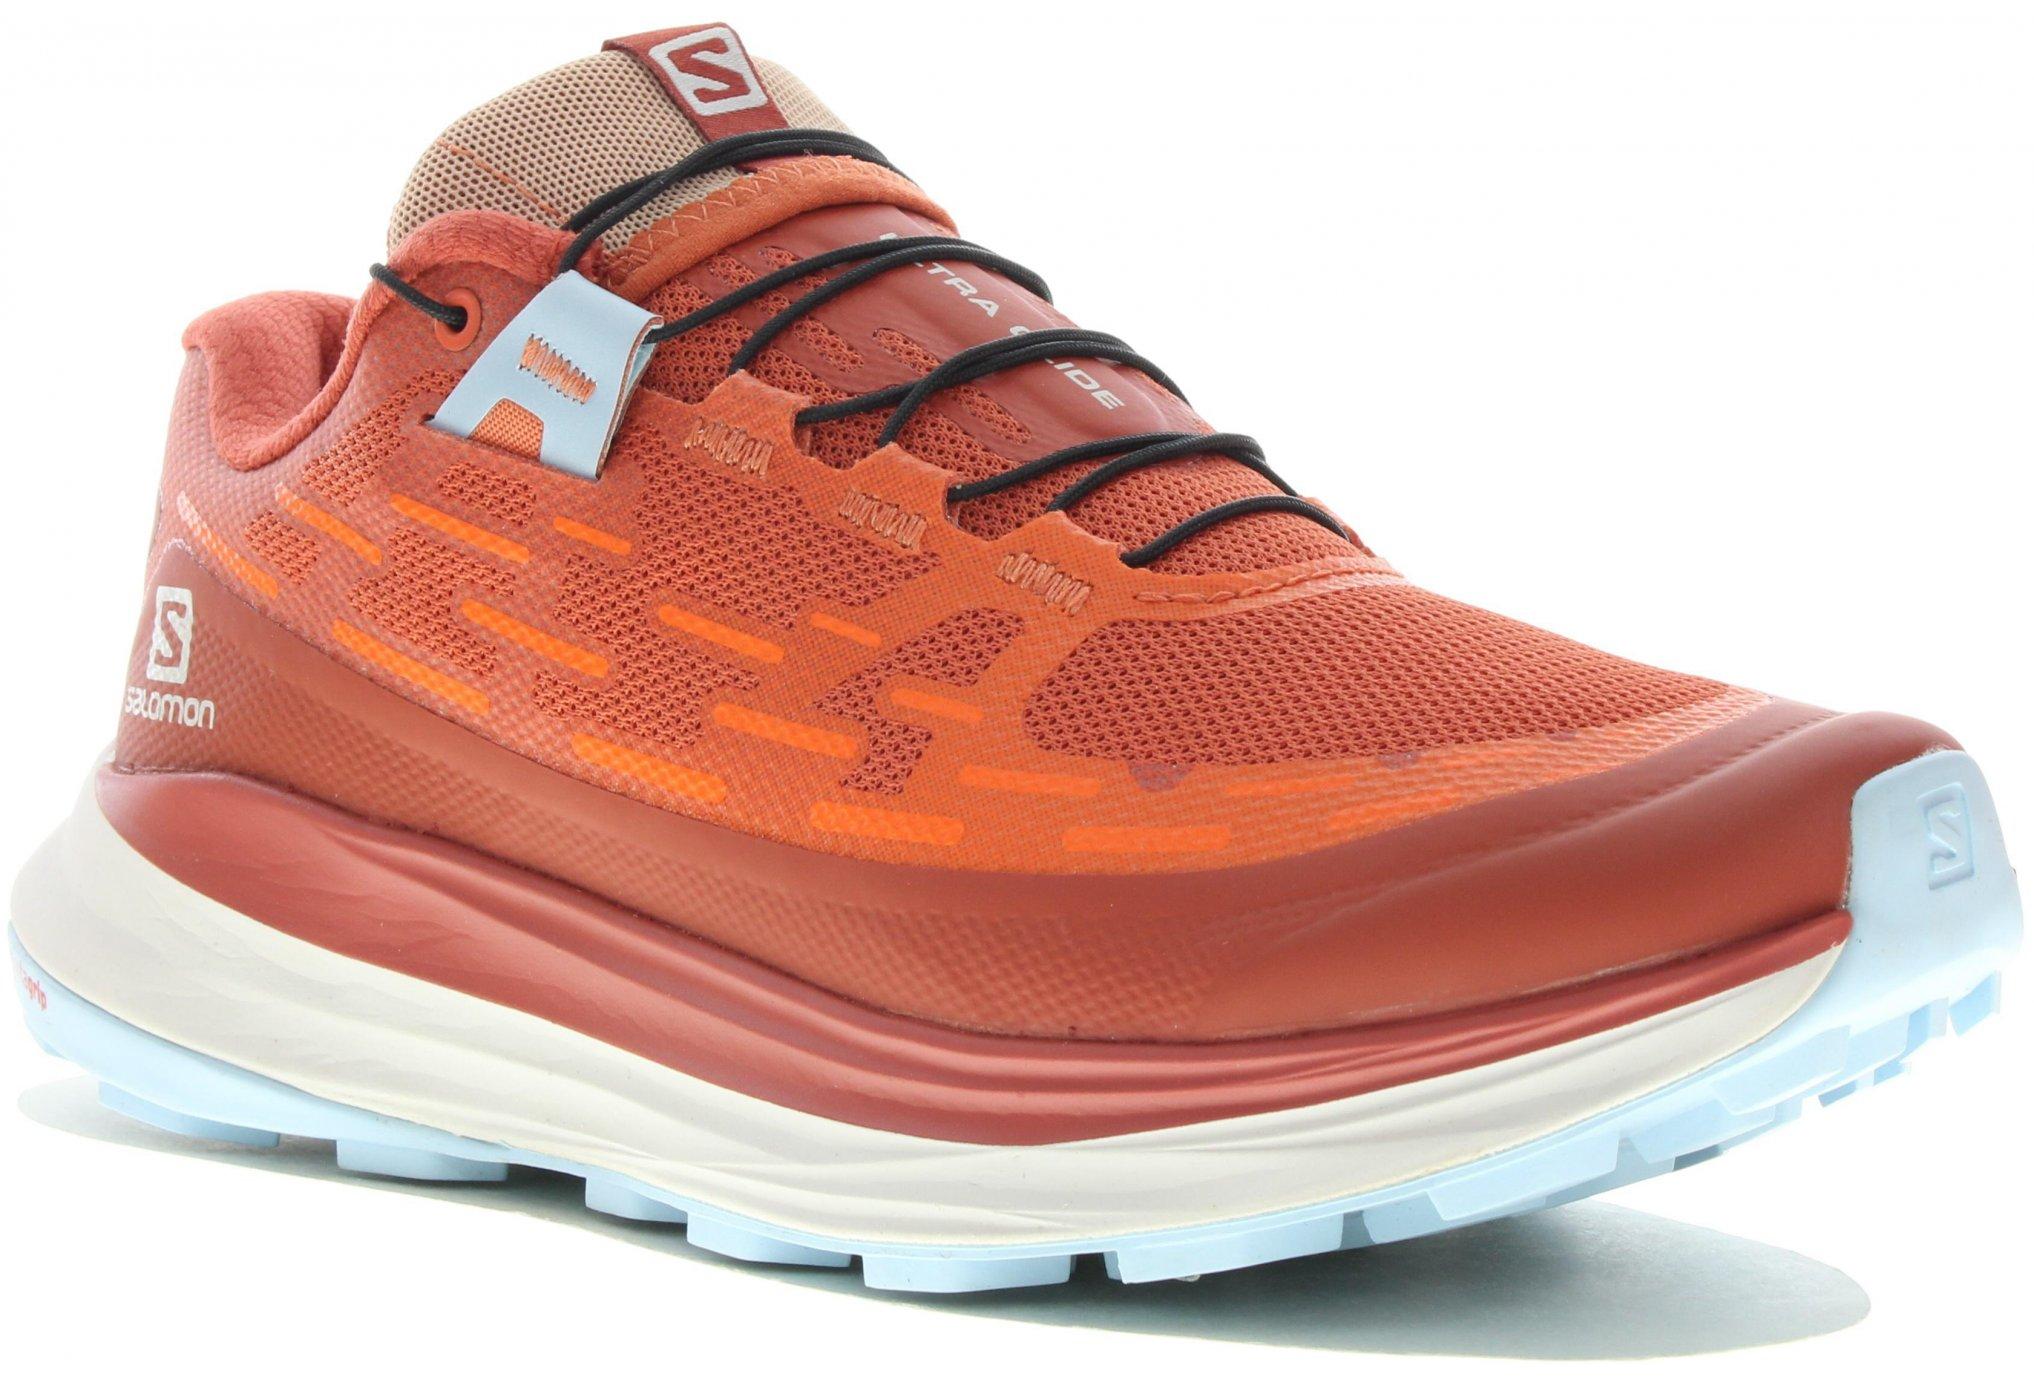 Salomon Ultra Glide W Chaussures running femme